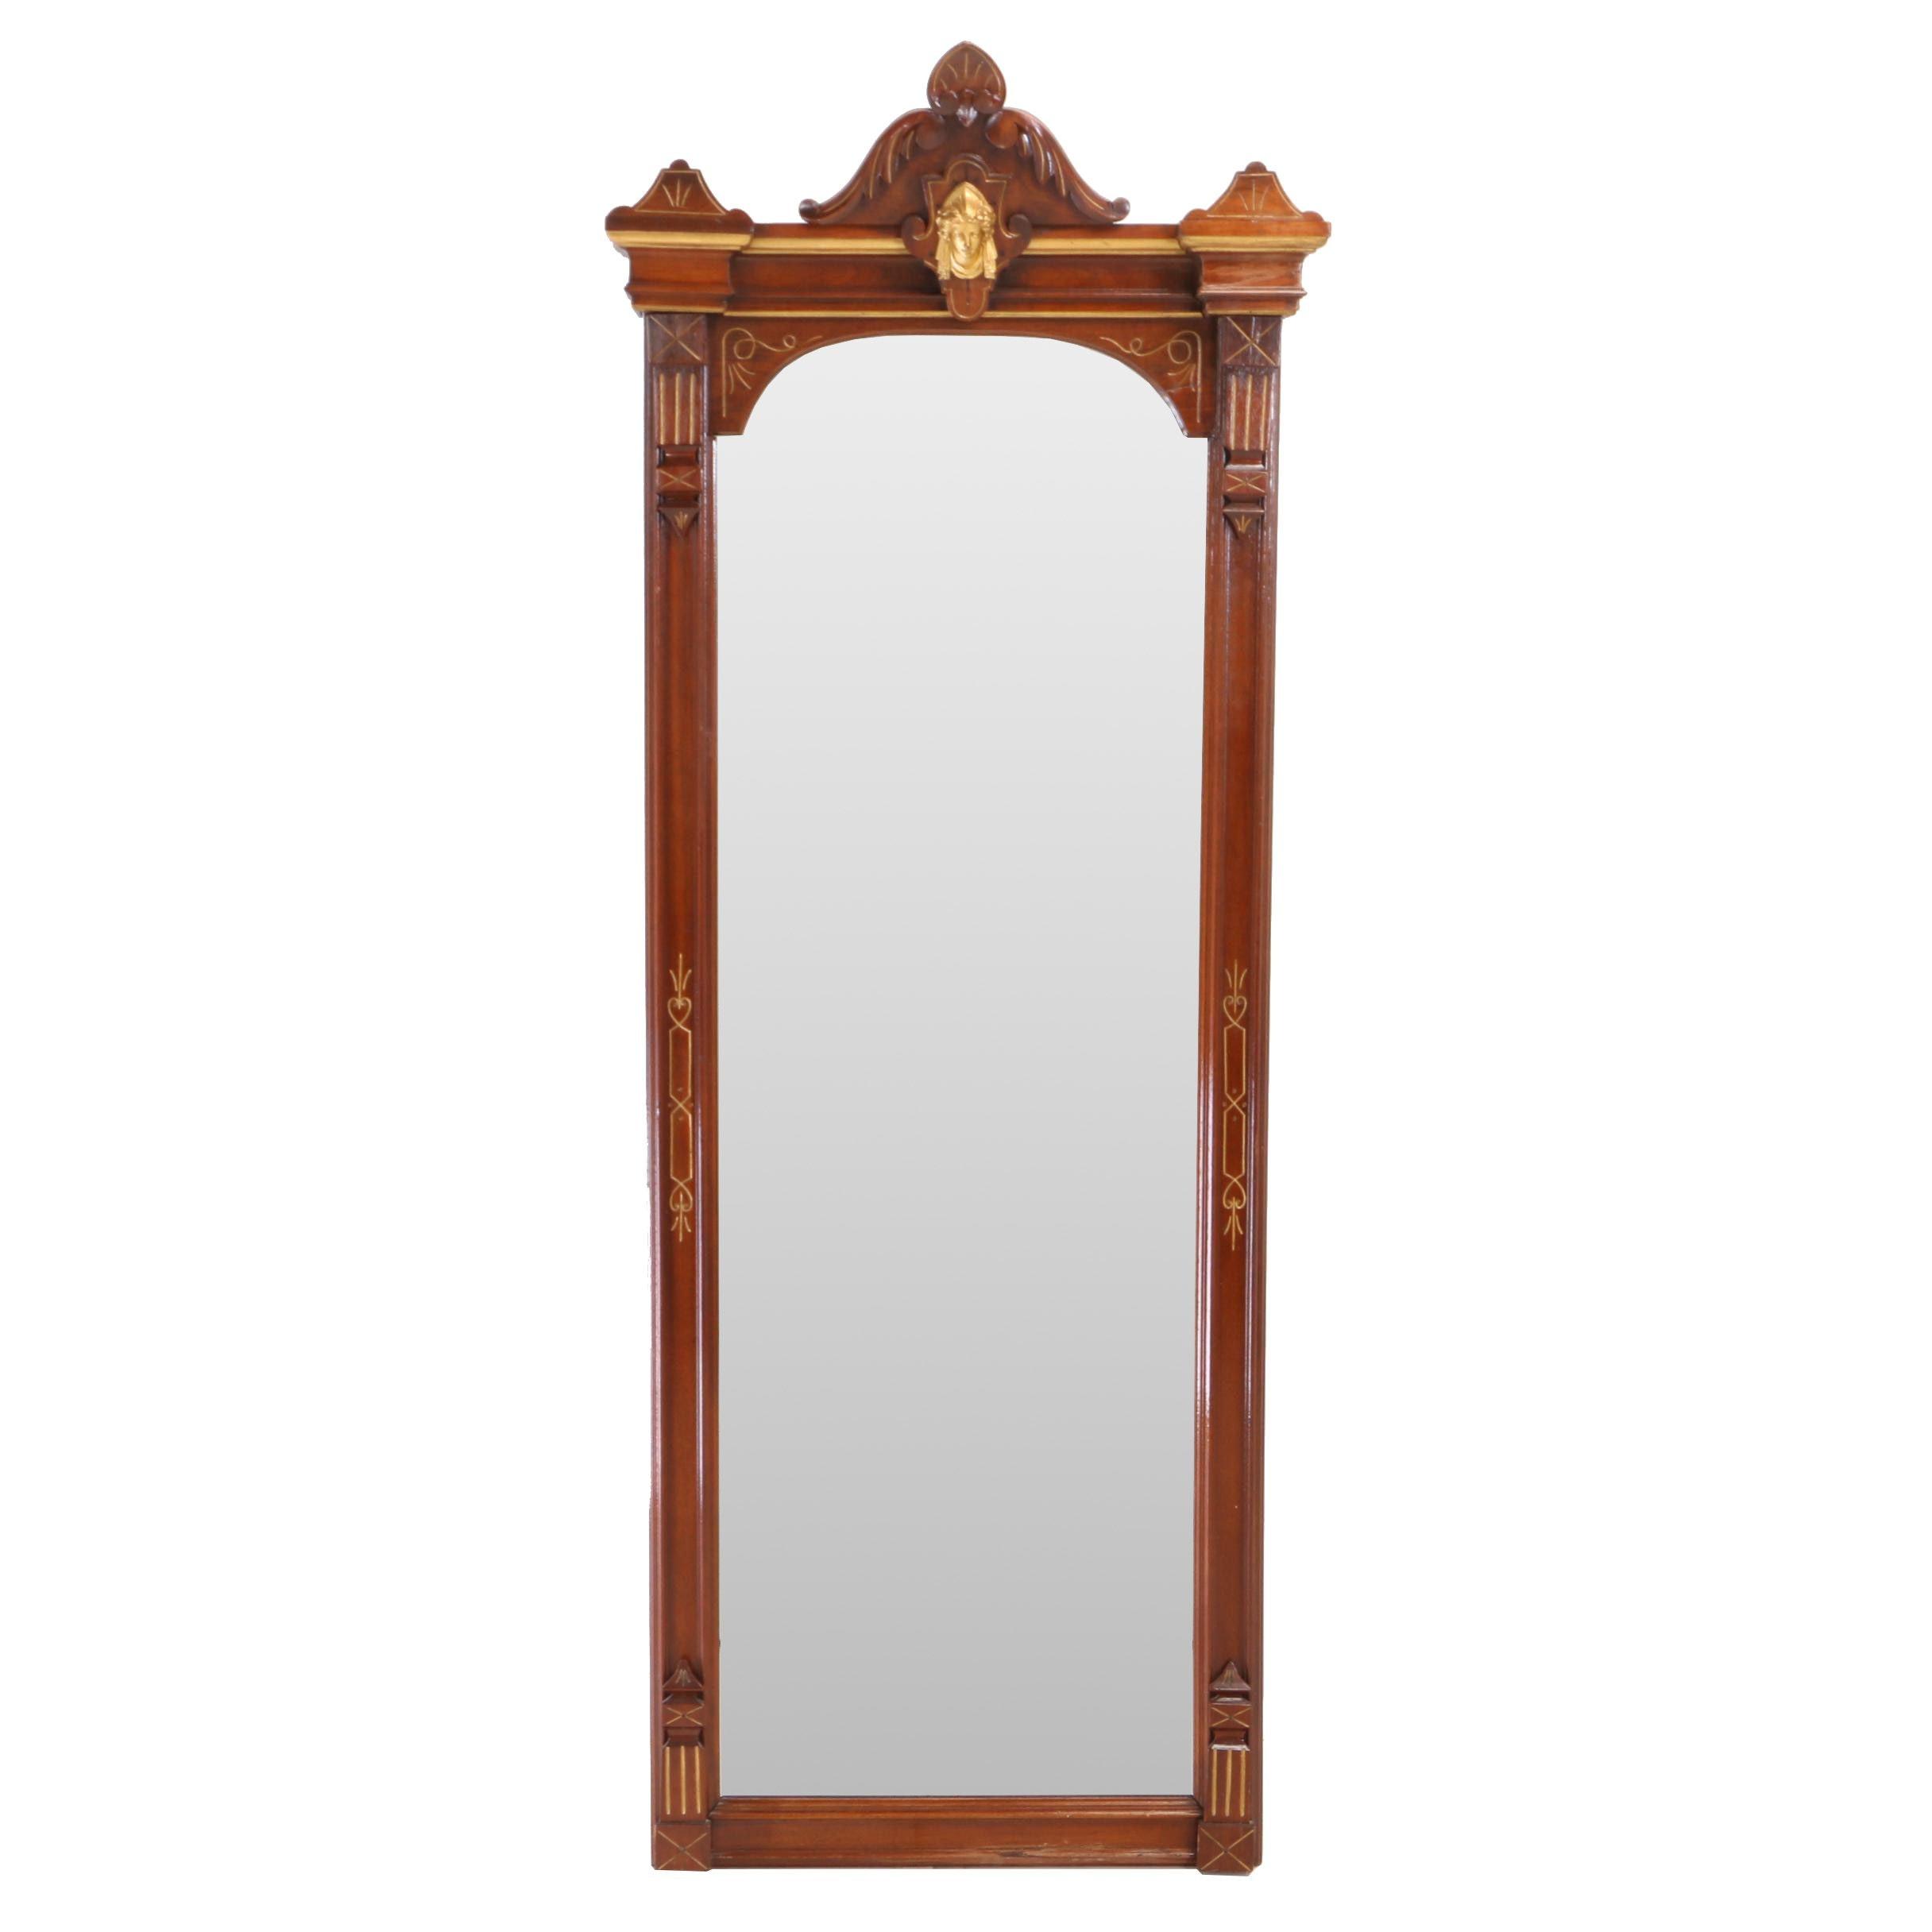 Renaissance Revival Walnut and Parcel-Gilt Pier Mirror, Circa 1870